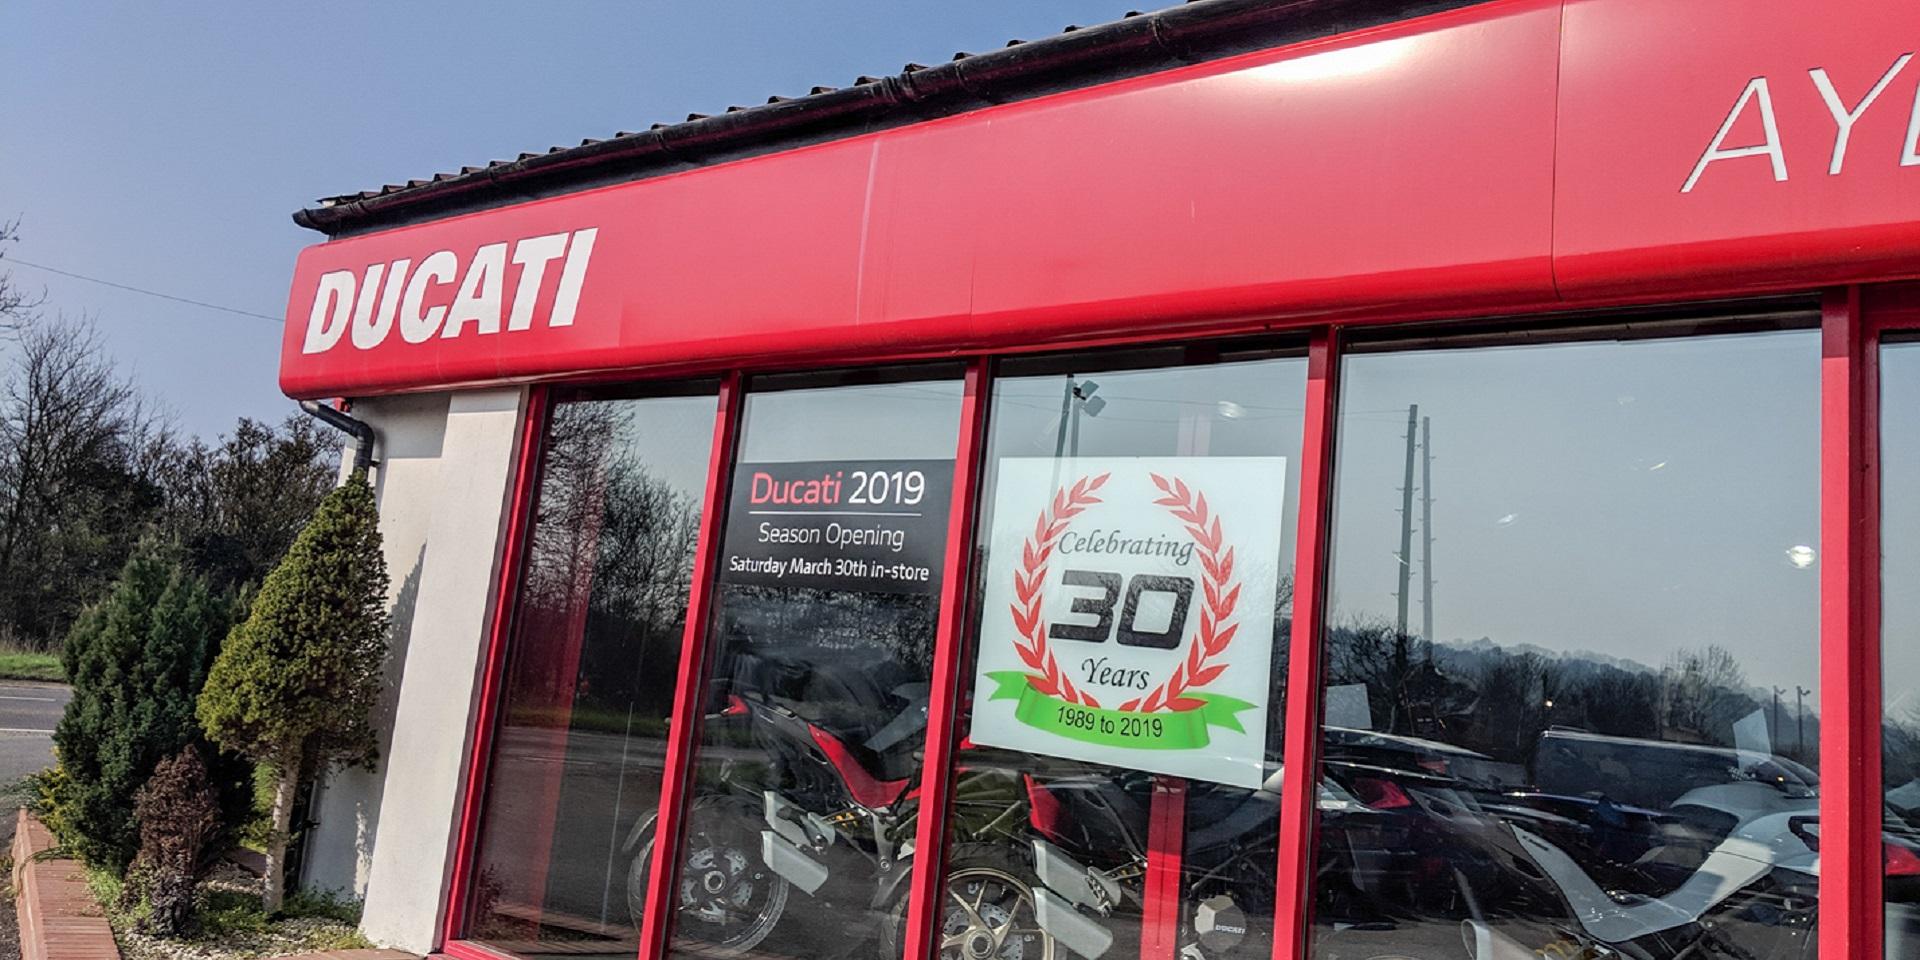 On Yer Bike Open Weekend 27-28th April